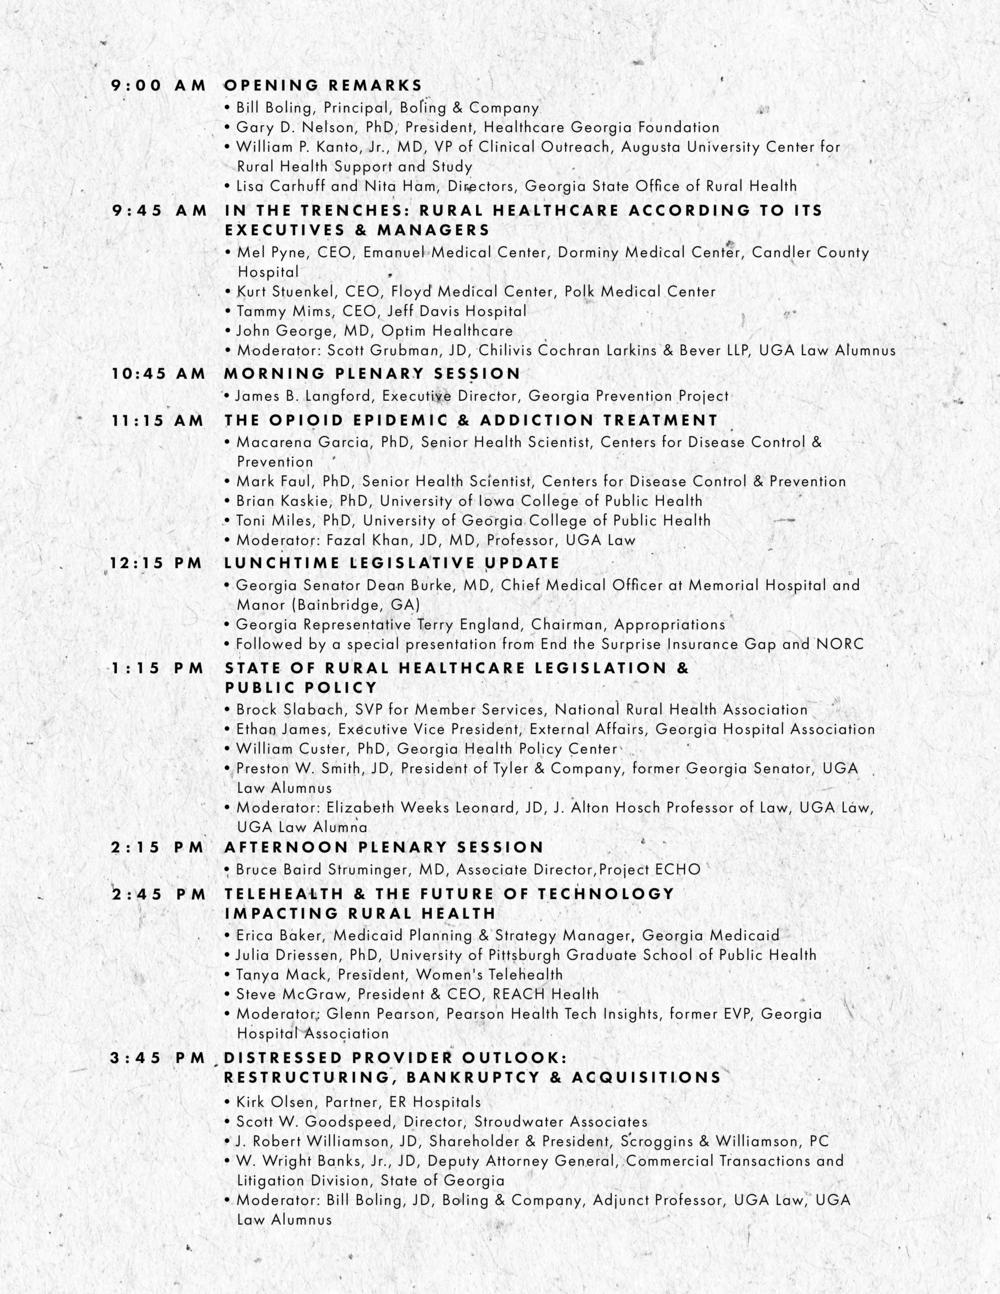 RHS_agenda_4.10.17.png